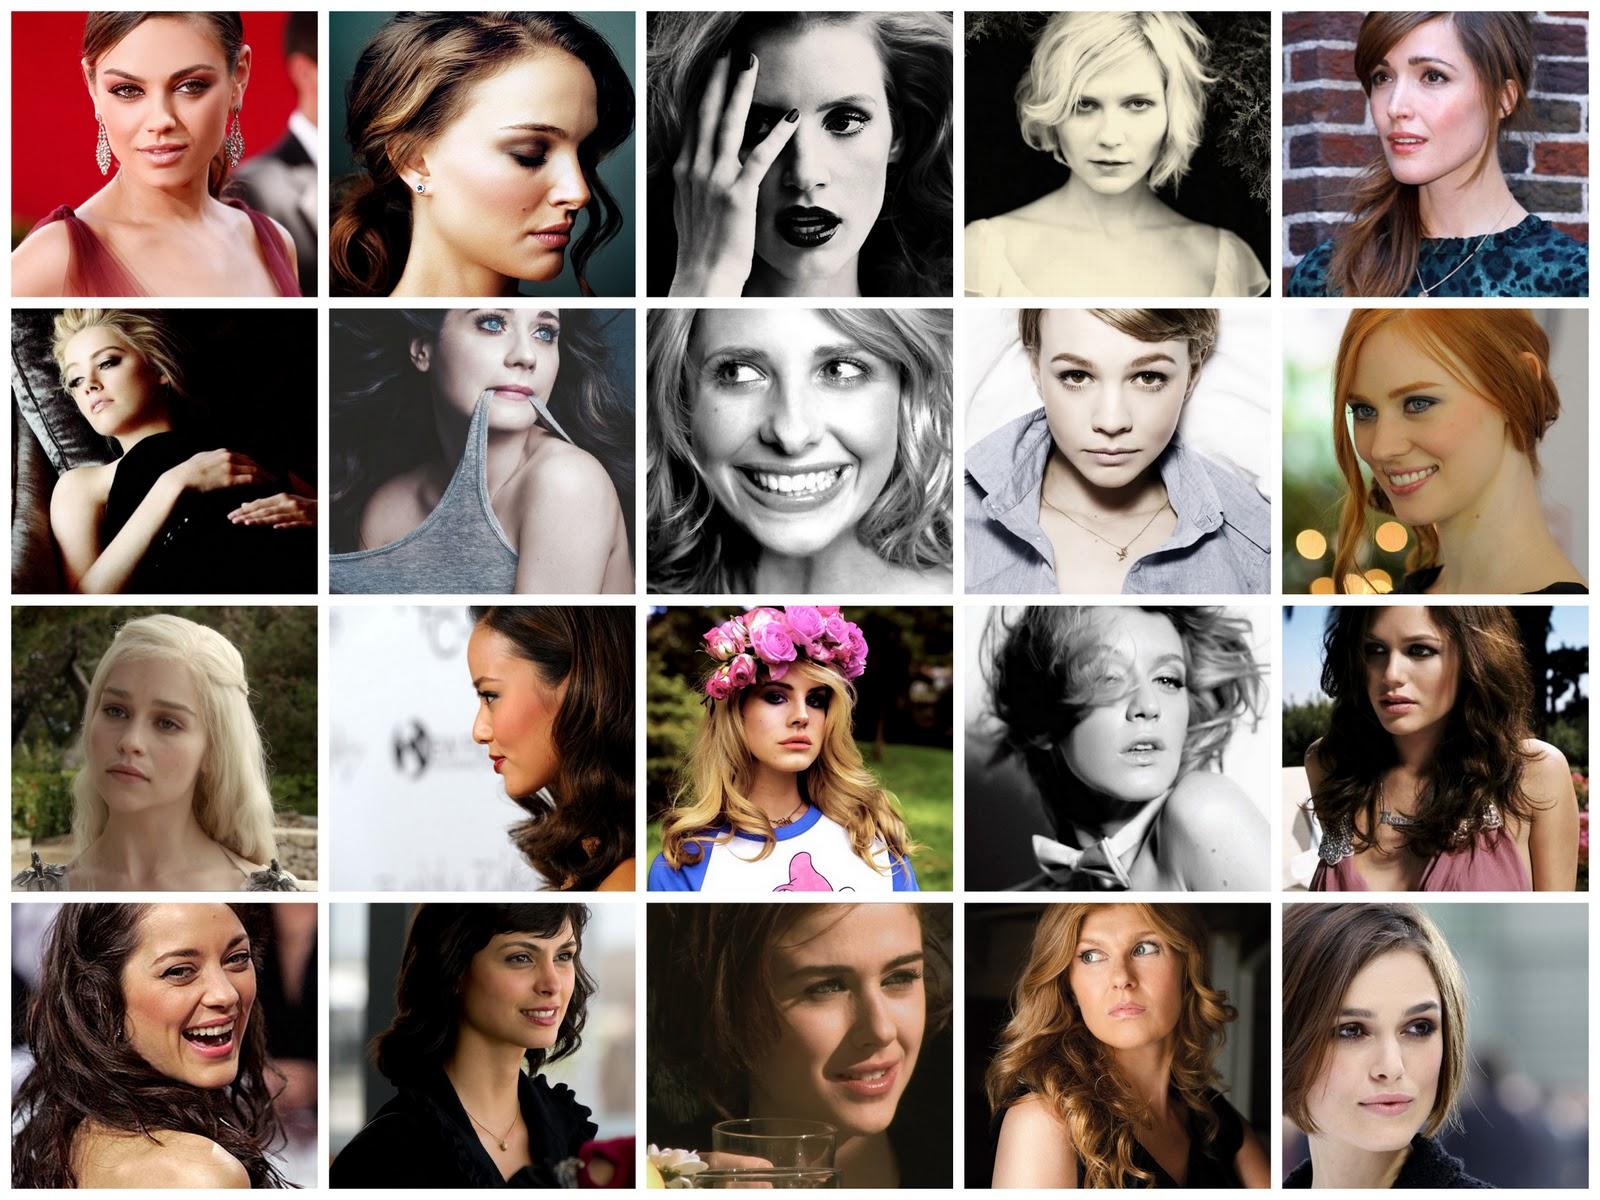 http://1.bp.blogspot.com/-rLlatofrsGQ/Tuz22k1oLCI/AAAAAAAAIVk/EPR5lfUc2LY/s1600/Cotta+adolescenziale+2011+pensieri+cannibali.jpg